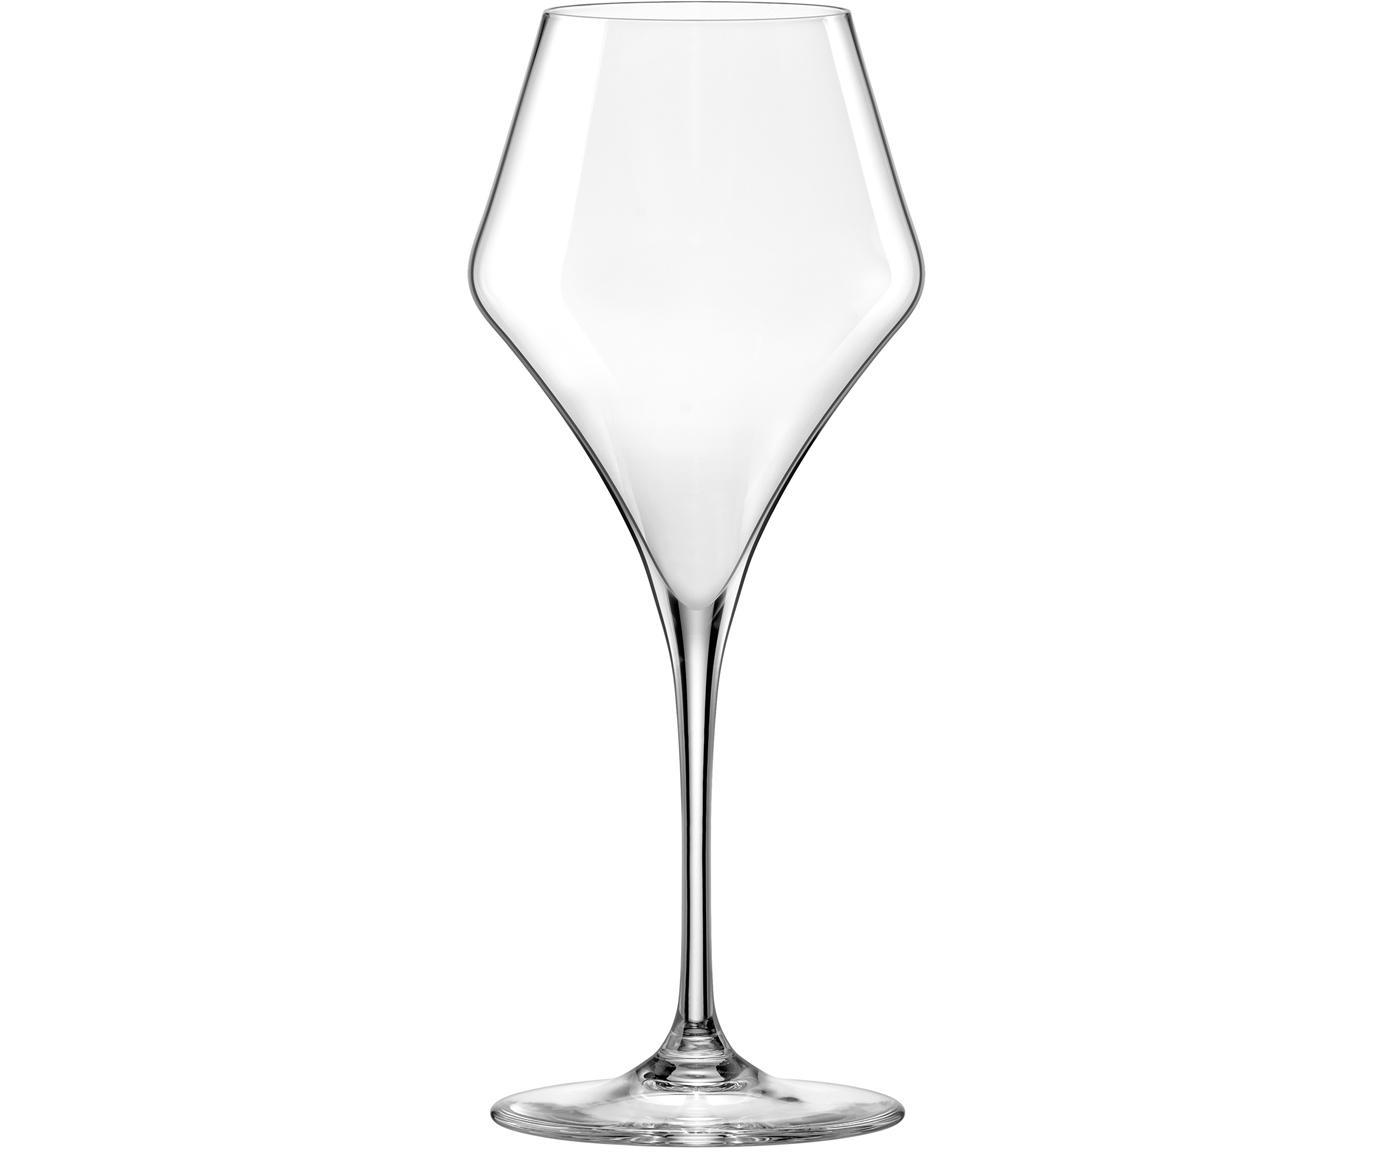 Bauchige Weißweingläser Aram, 6er-Set, Glas, Transparent, Ø 9 x H 22 cm